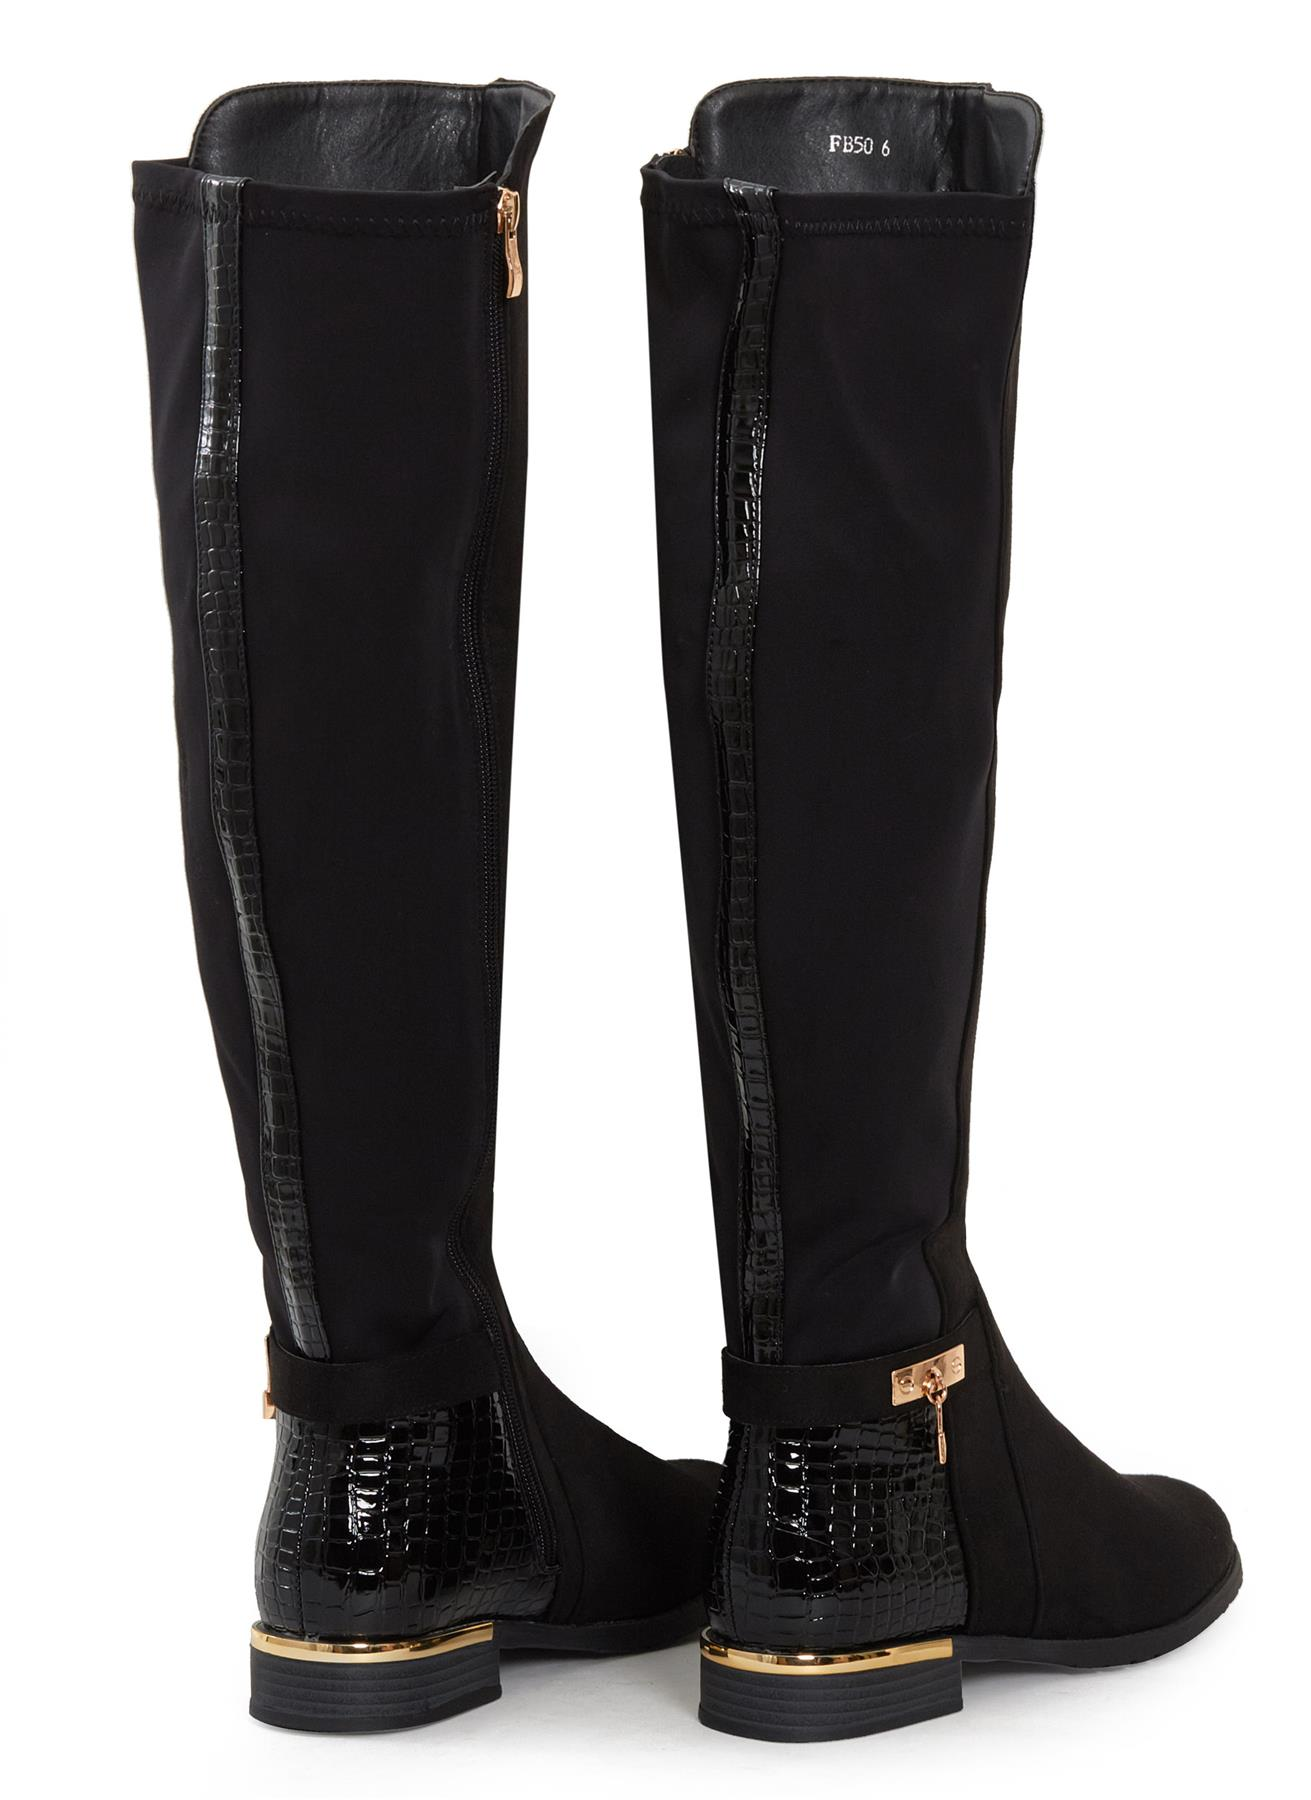 Womens-Ladies-Knee-High-Gold-Detail-Low-Block-Heel-Zip-Up-PU-Suede-Black-Boots thumbnail 11